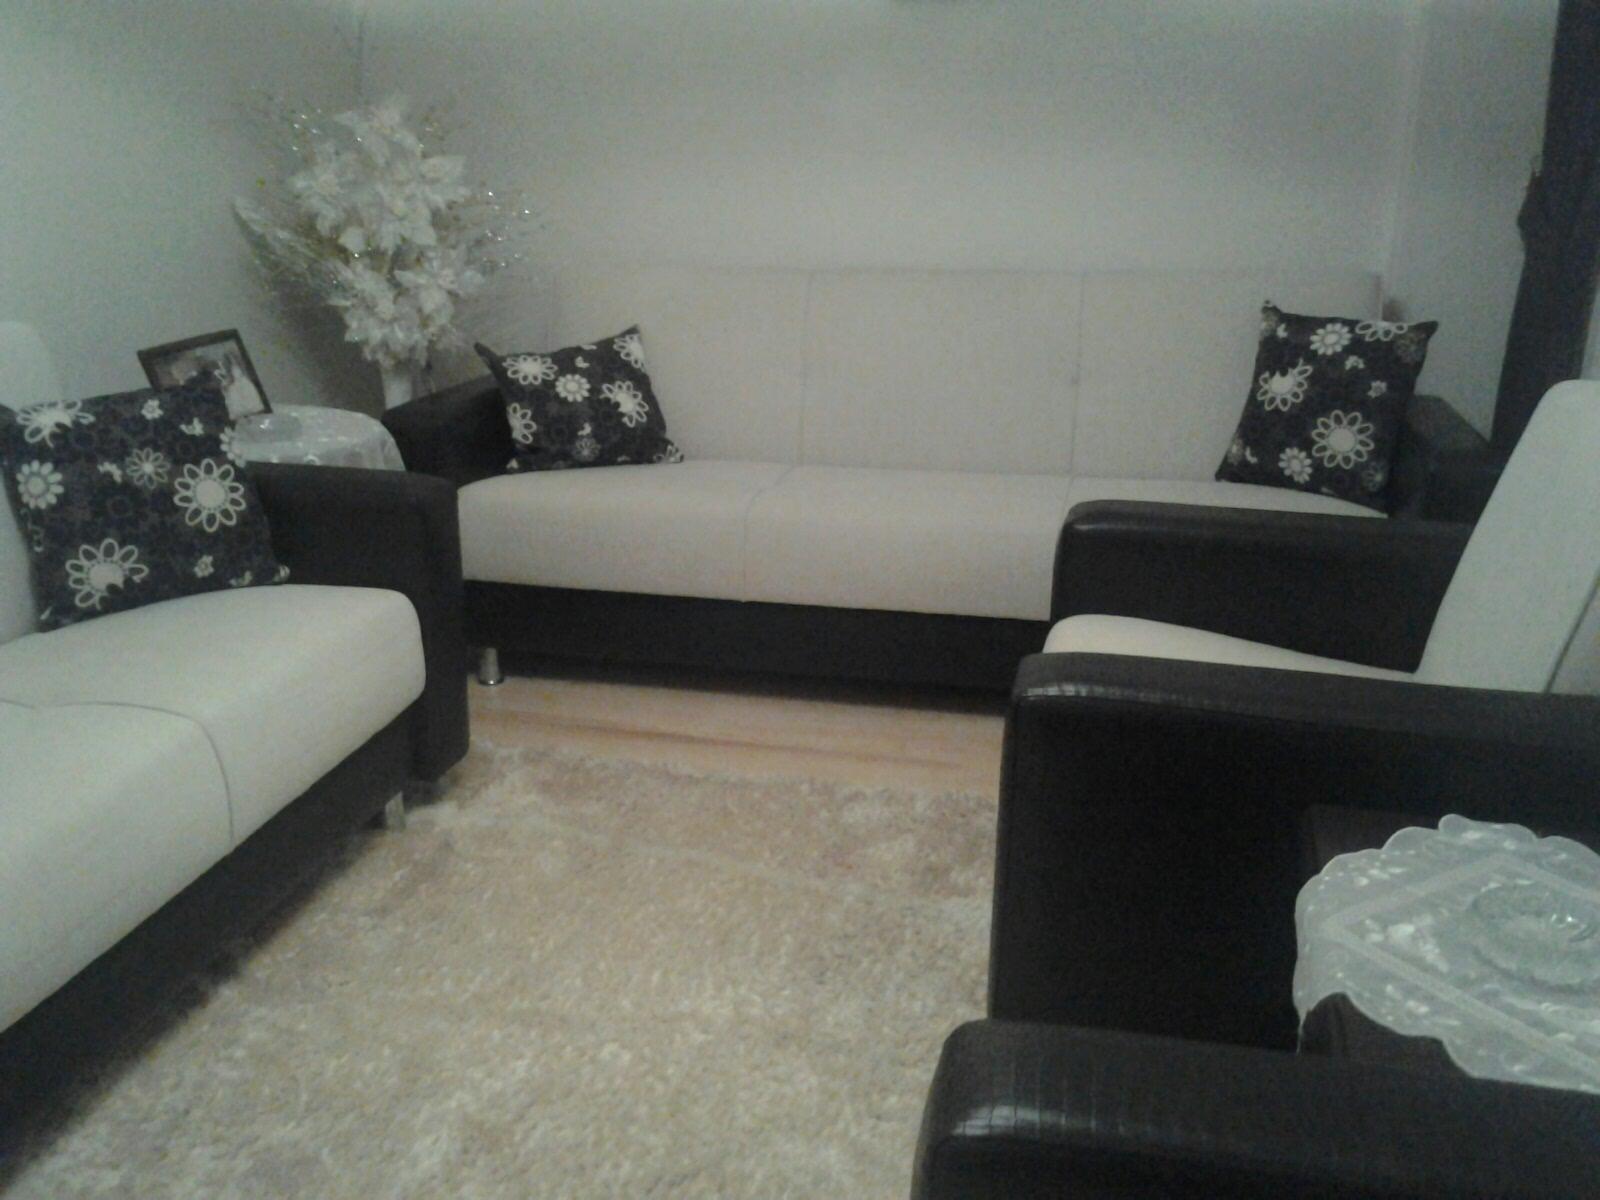 2. el mobilya